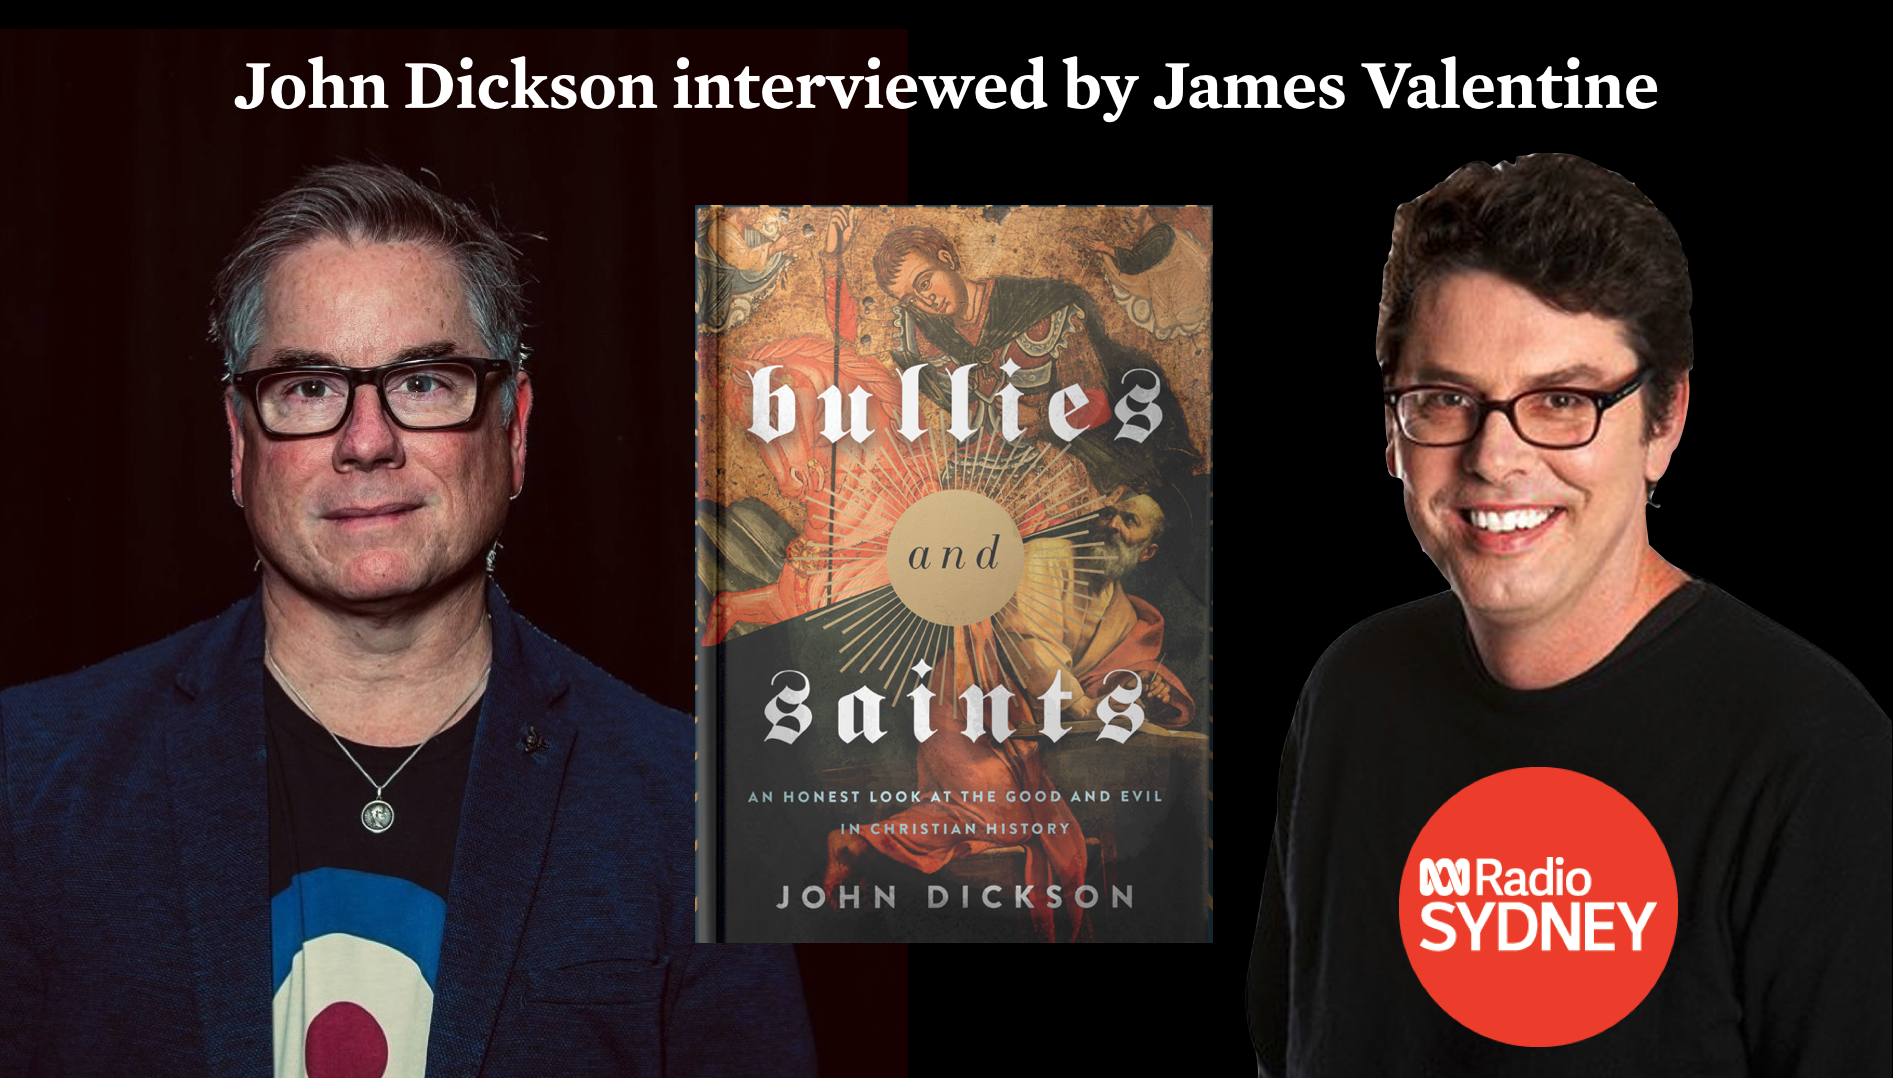 John Dickson ABC Radio interview